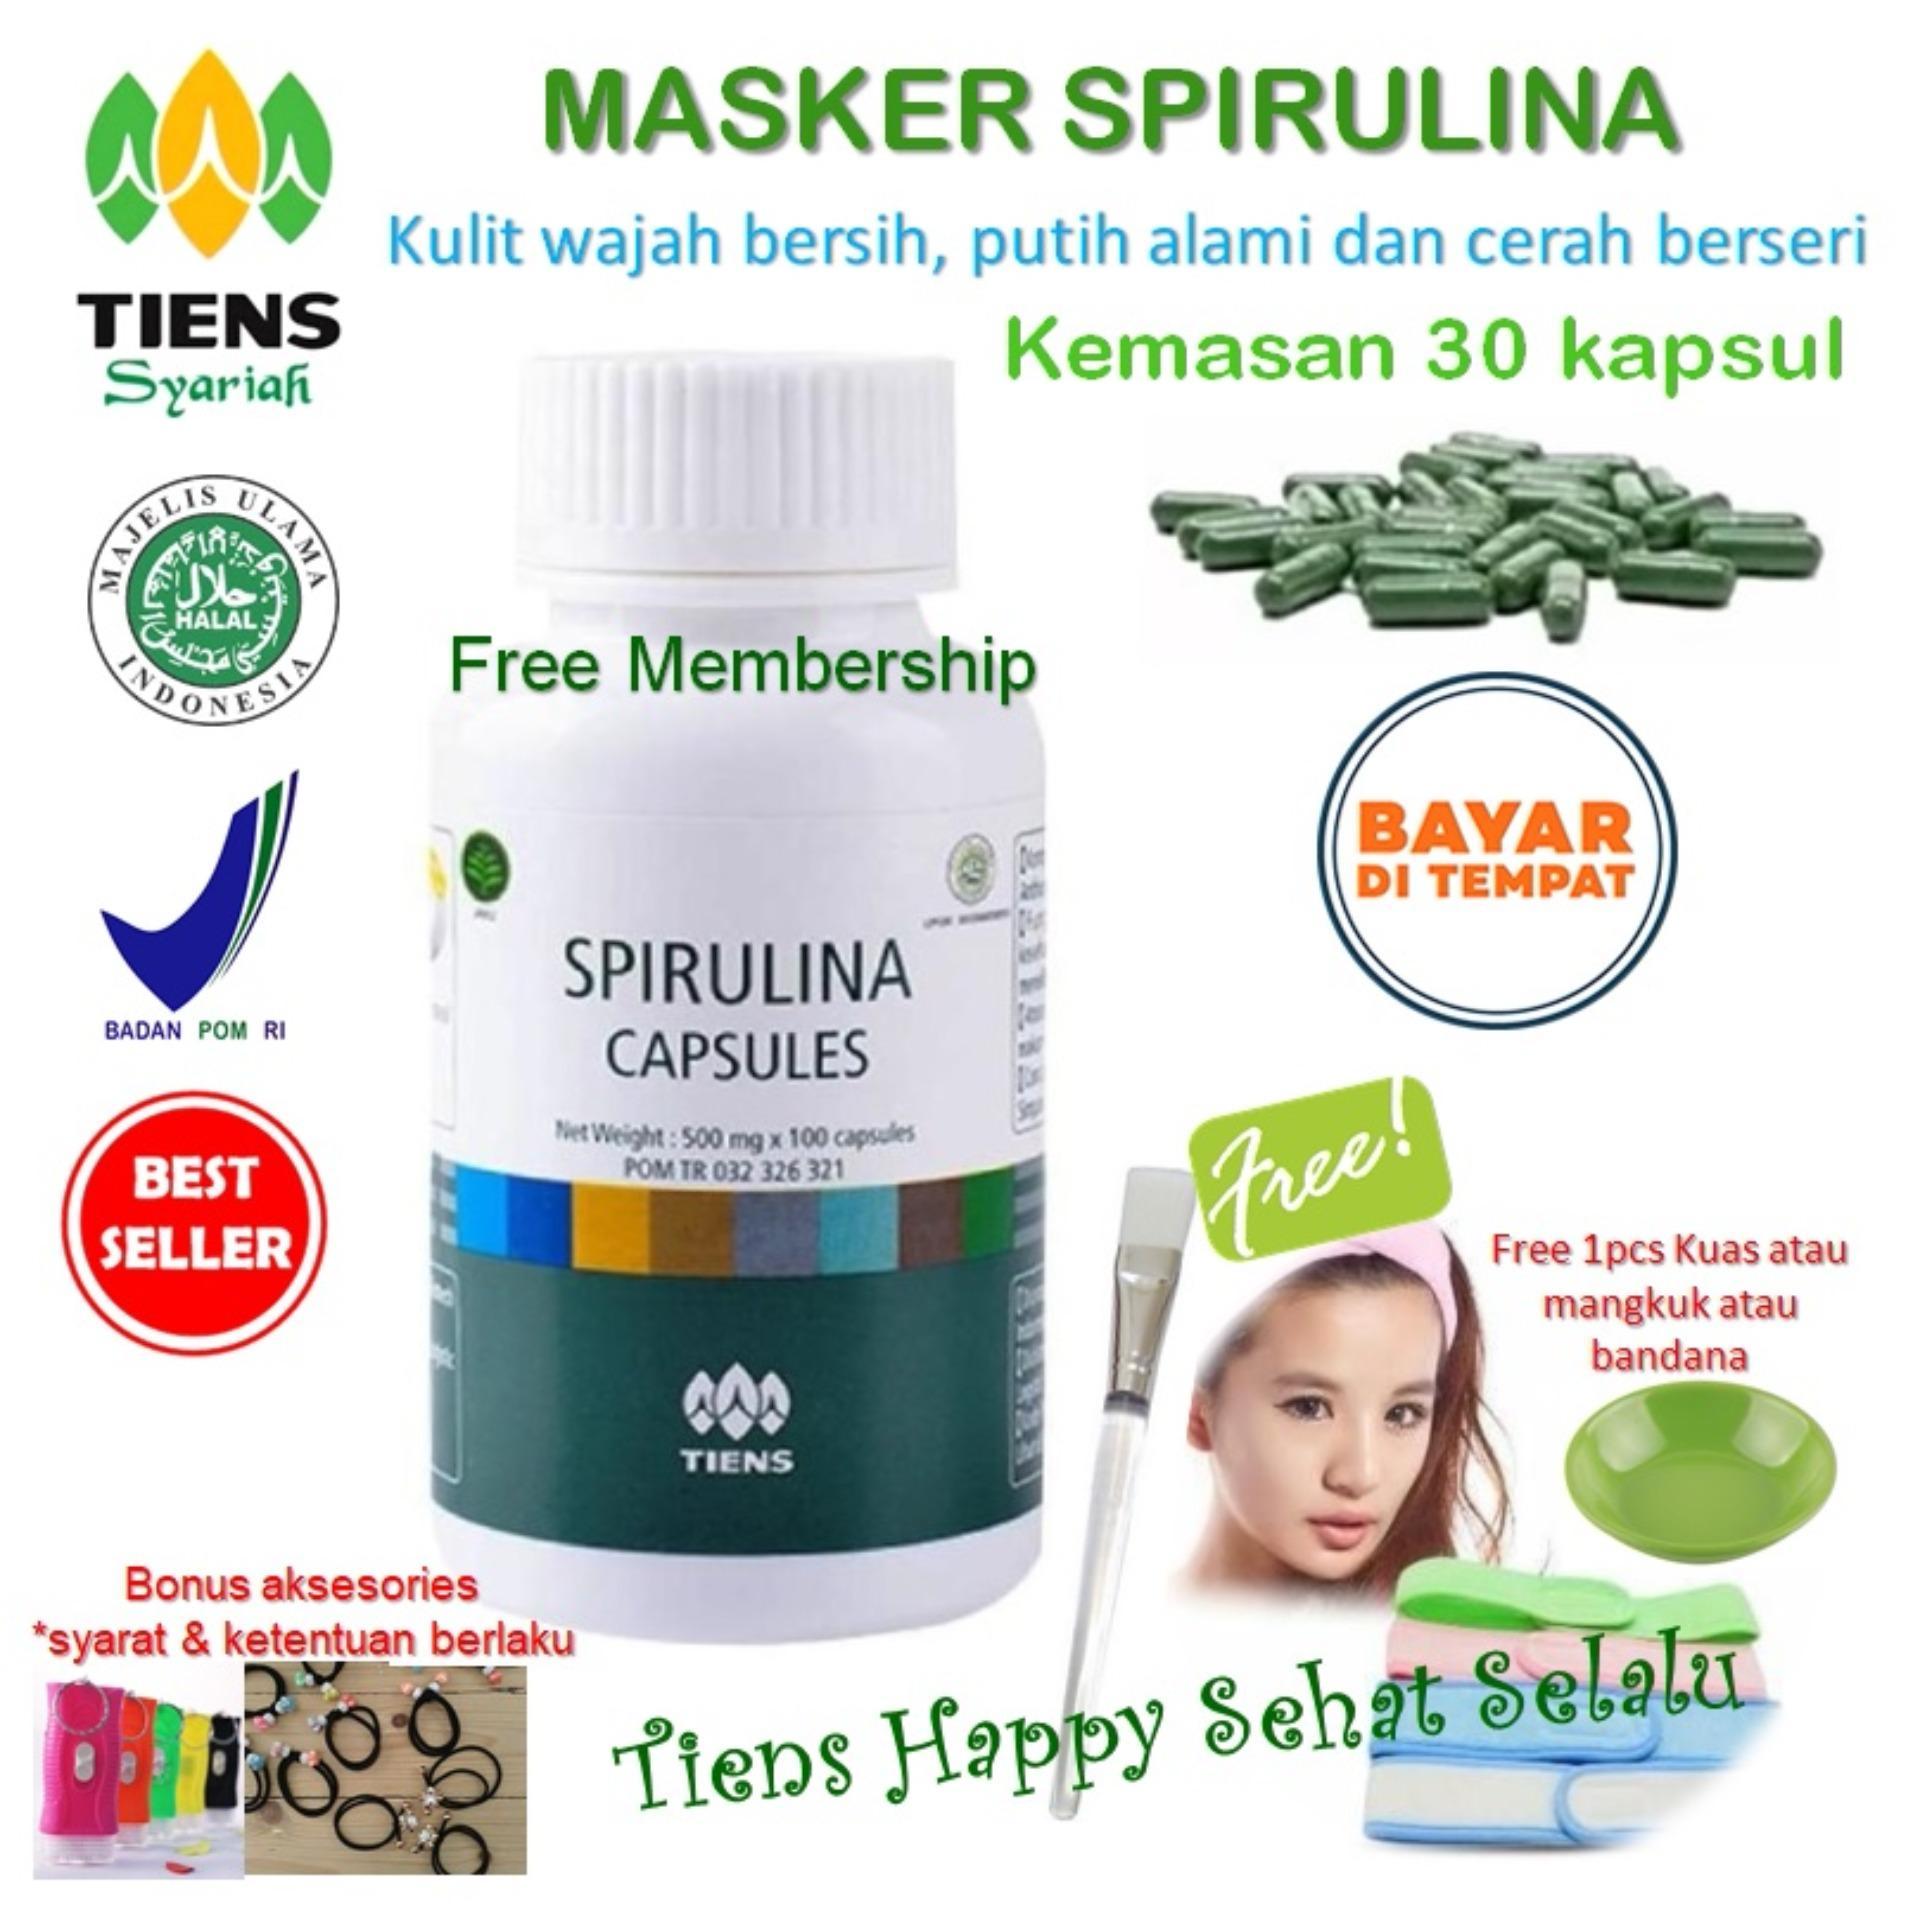 Masker Spirulina Herbal Pemutih Wajah Tiens Isi 30 Kapsul Diskon Indonesia